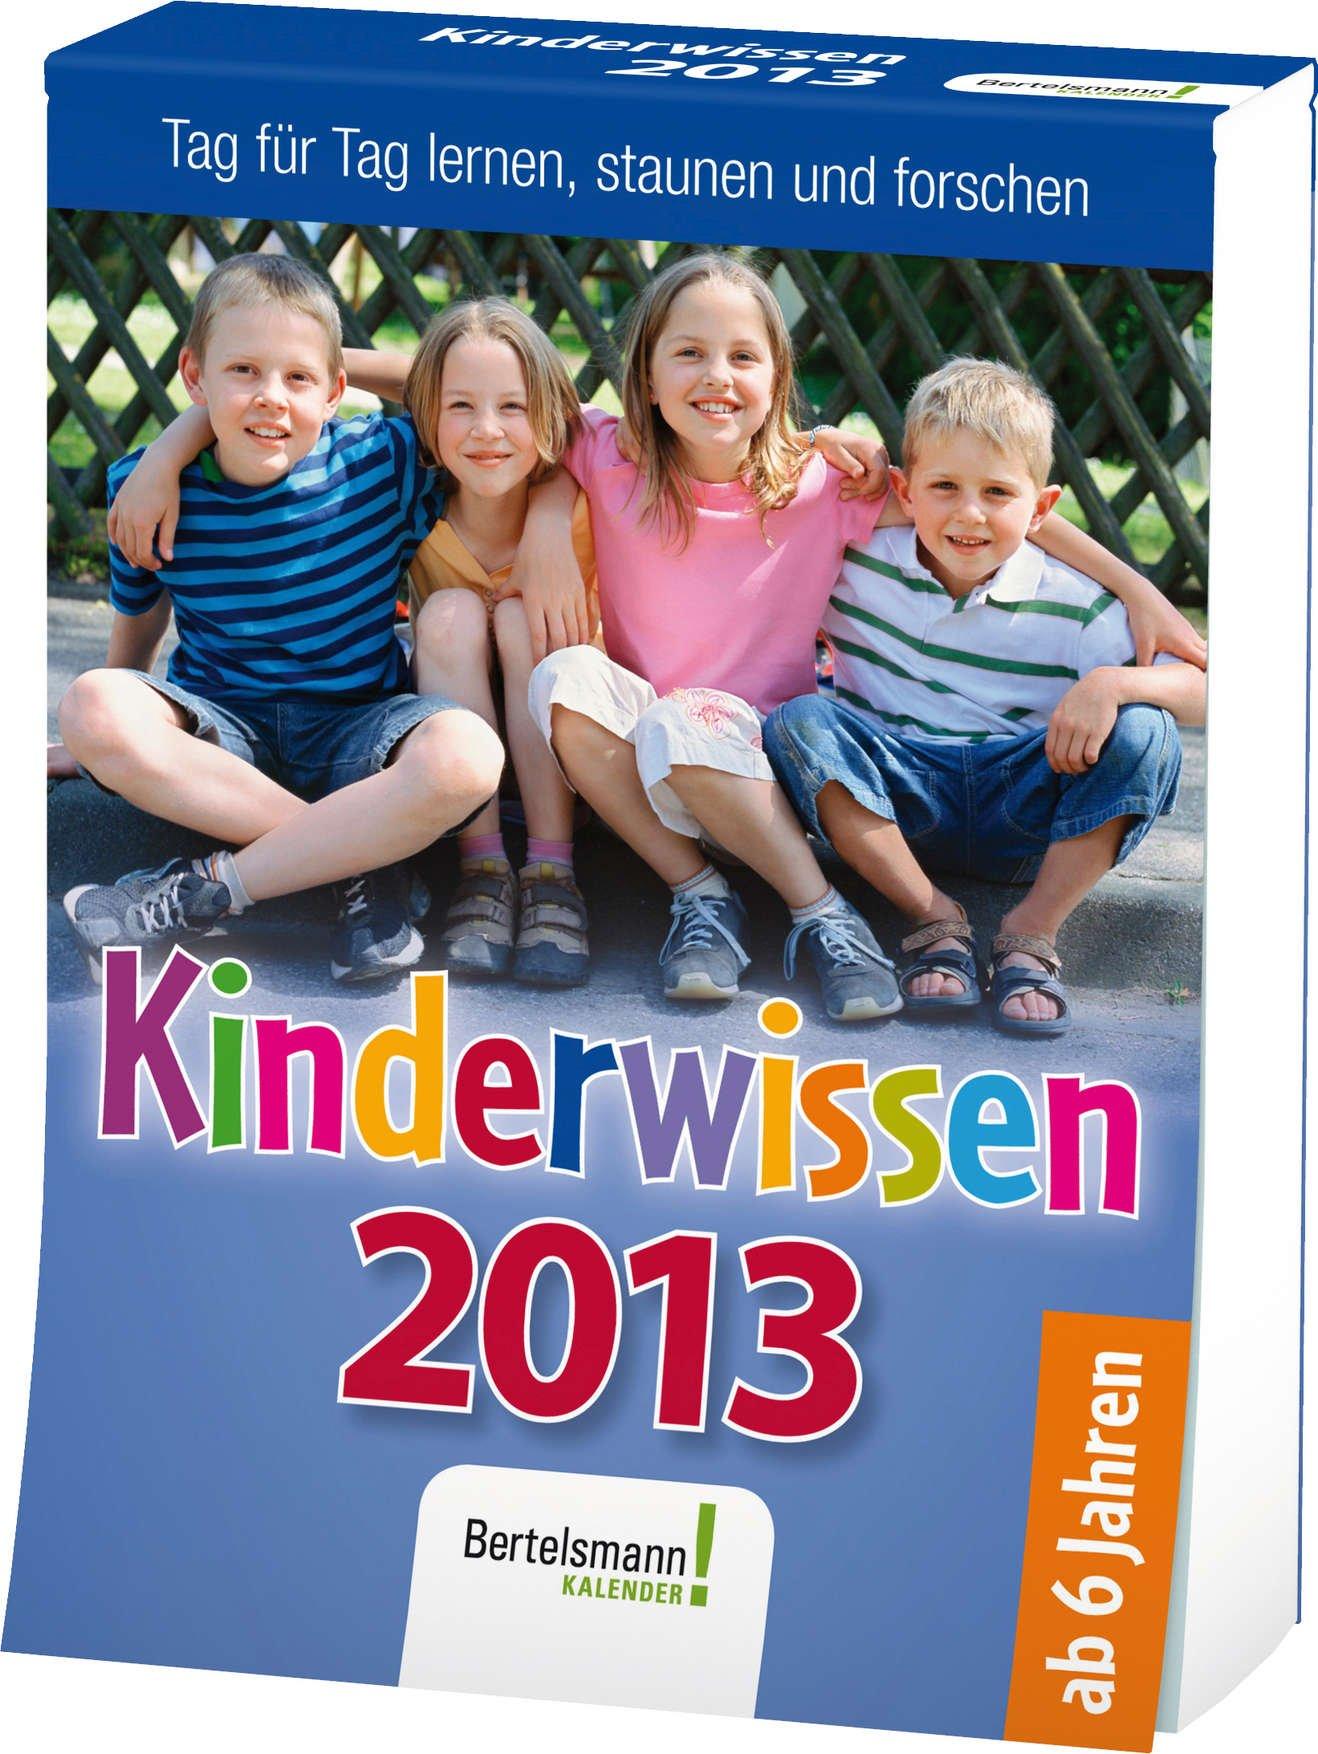 Kinderwissen 2013